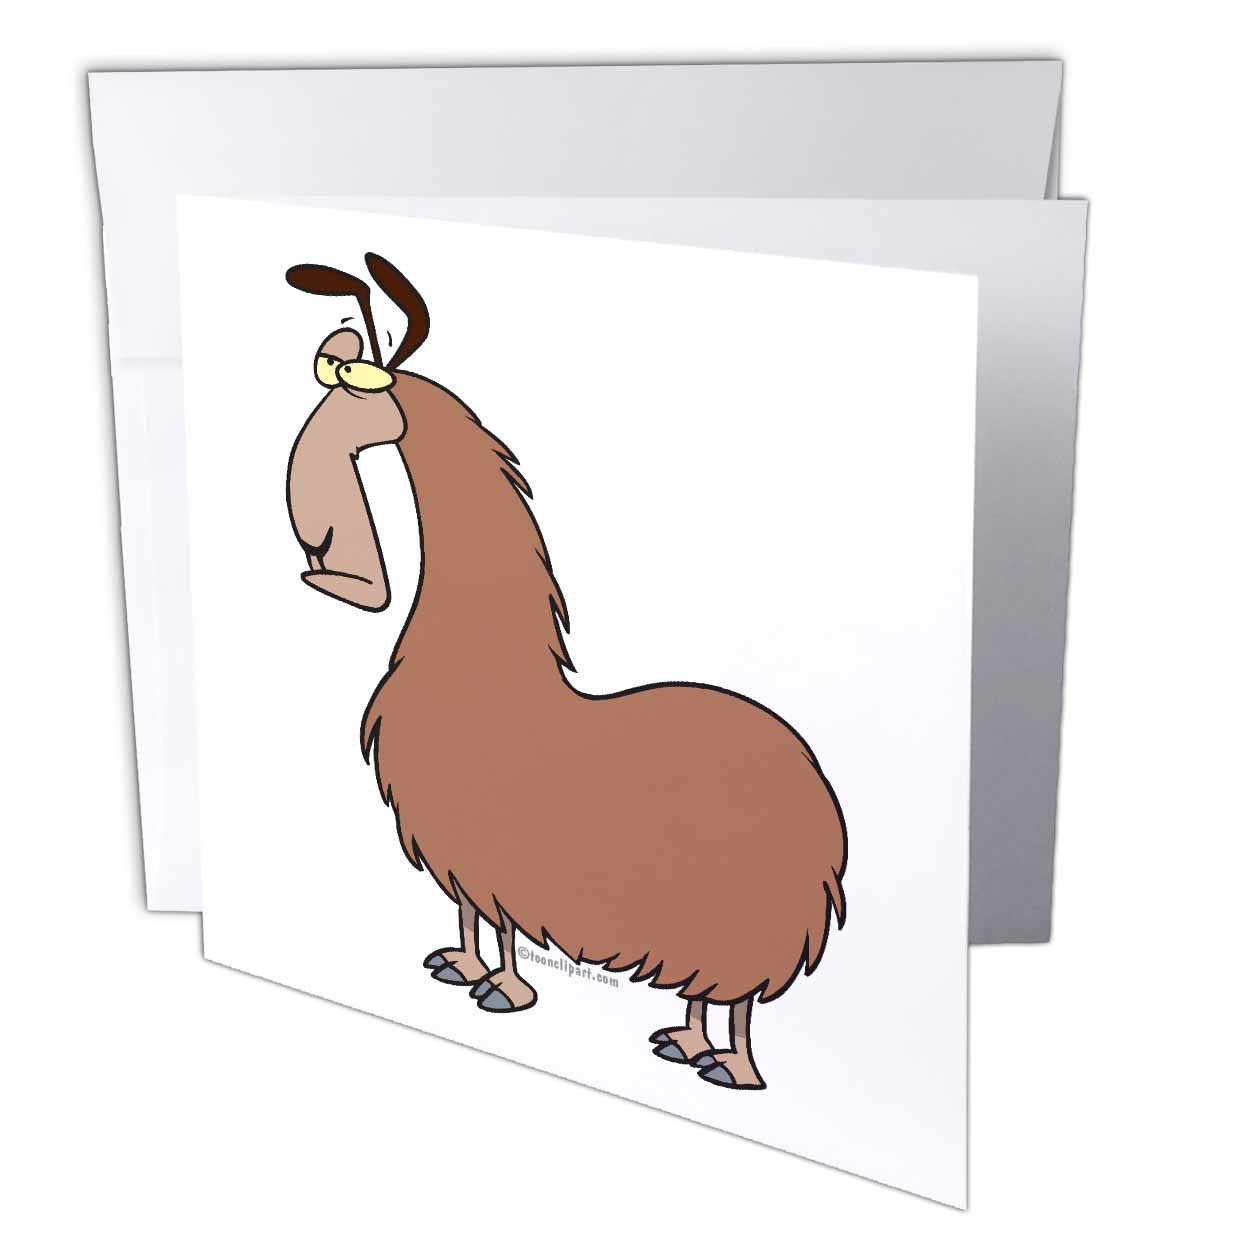 3dRose Goofy Llama Cartoon, Greeting Cards, 6 x 6 inches, set of 12